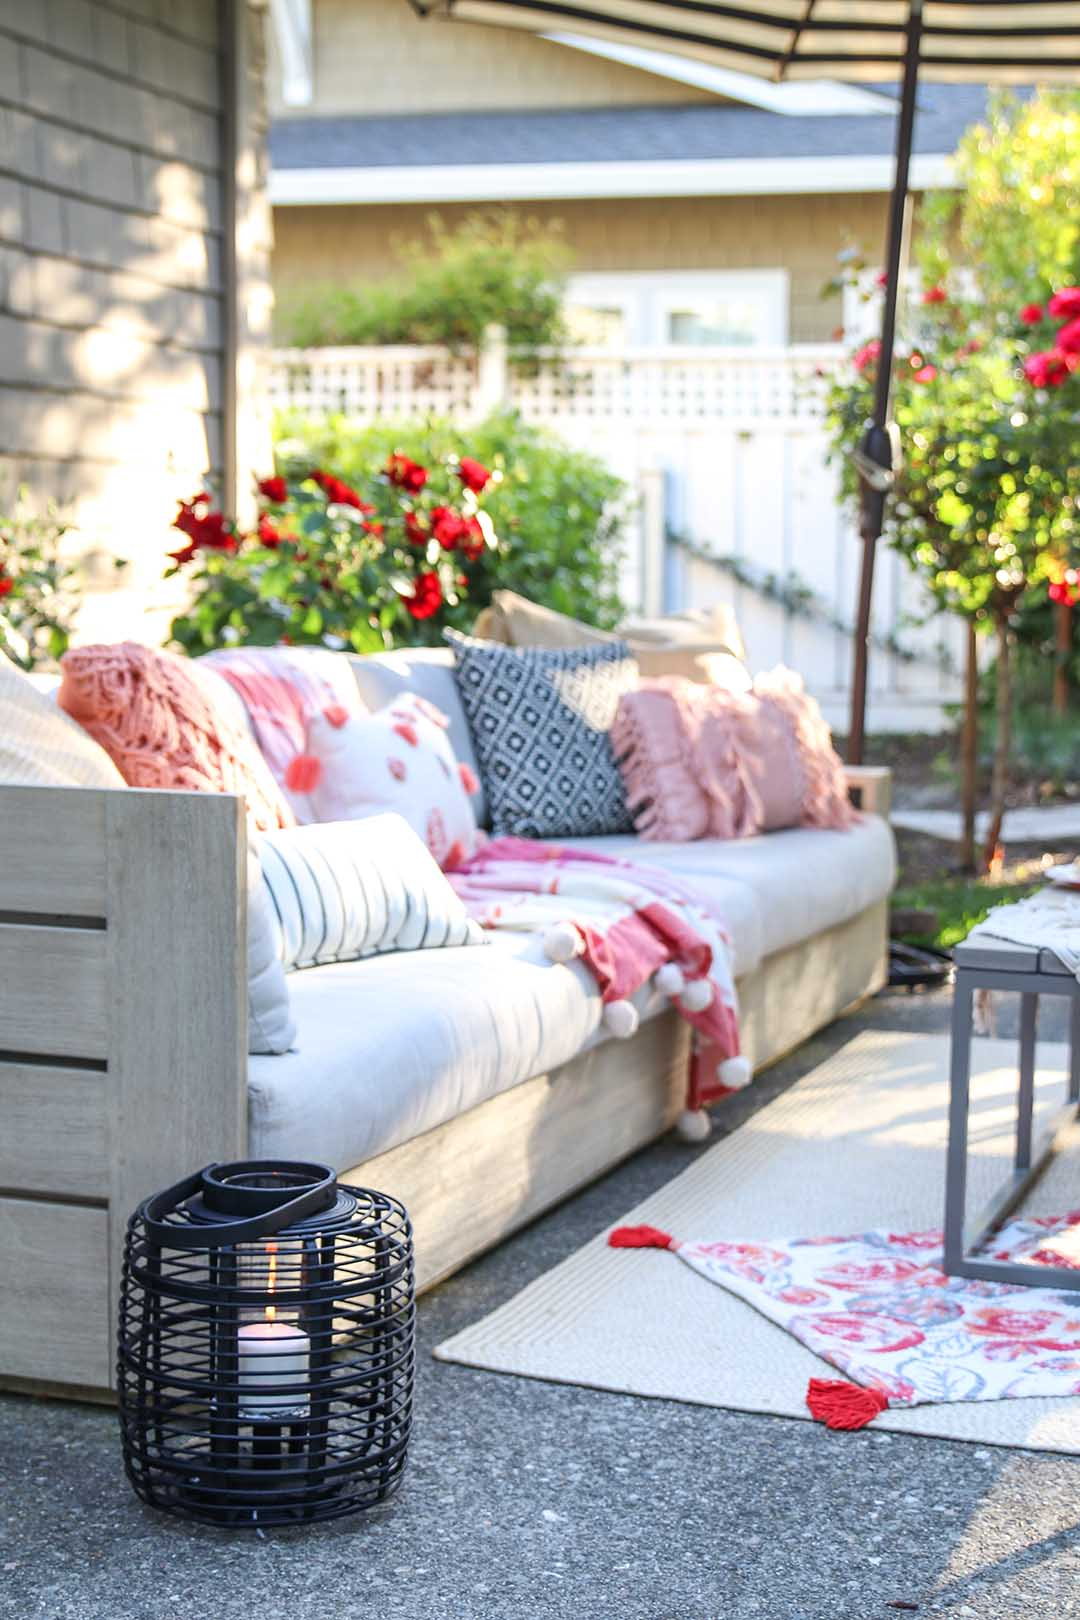 Patio Decorating Ideas 7 Simple Summer Updates  Modern Glam